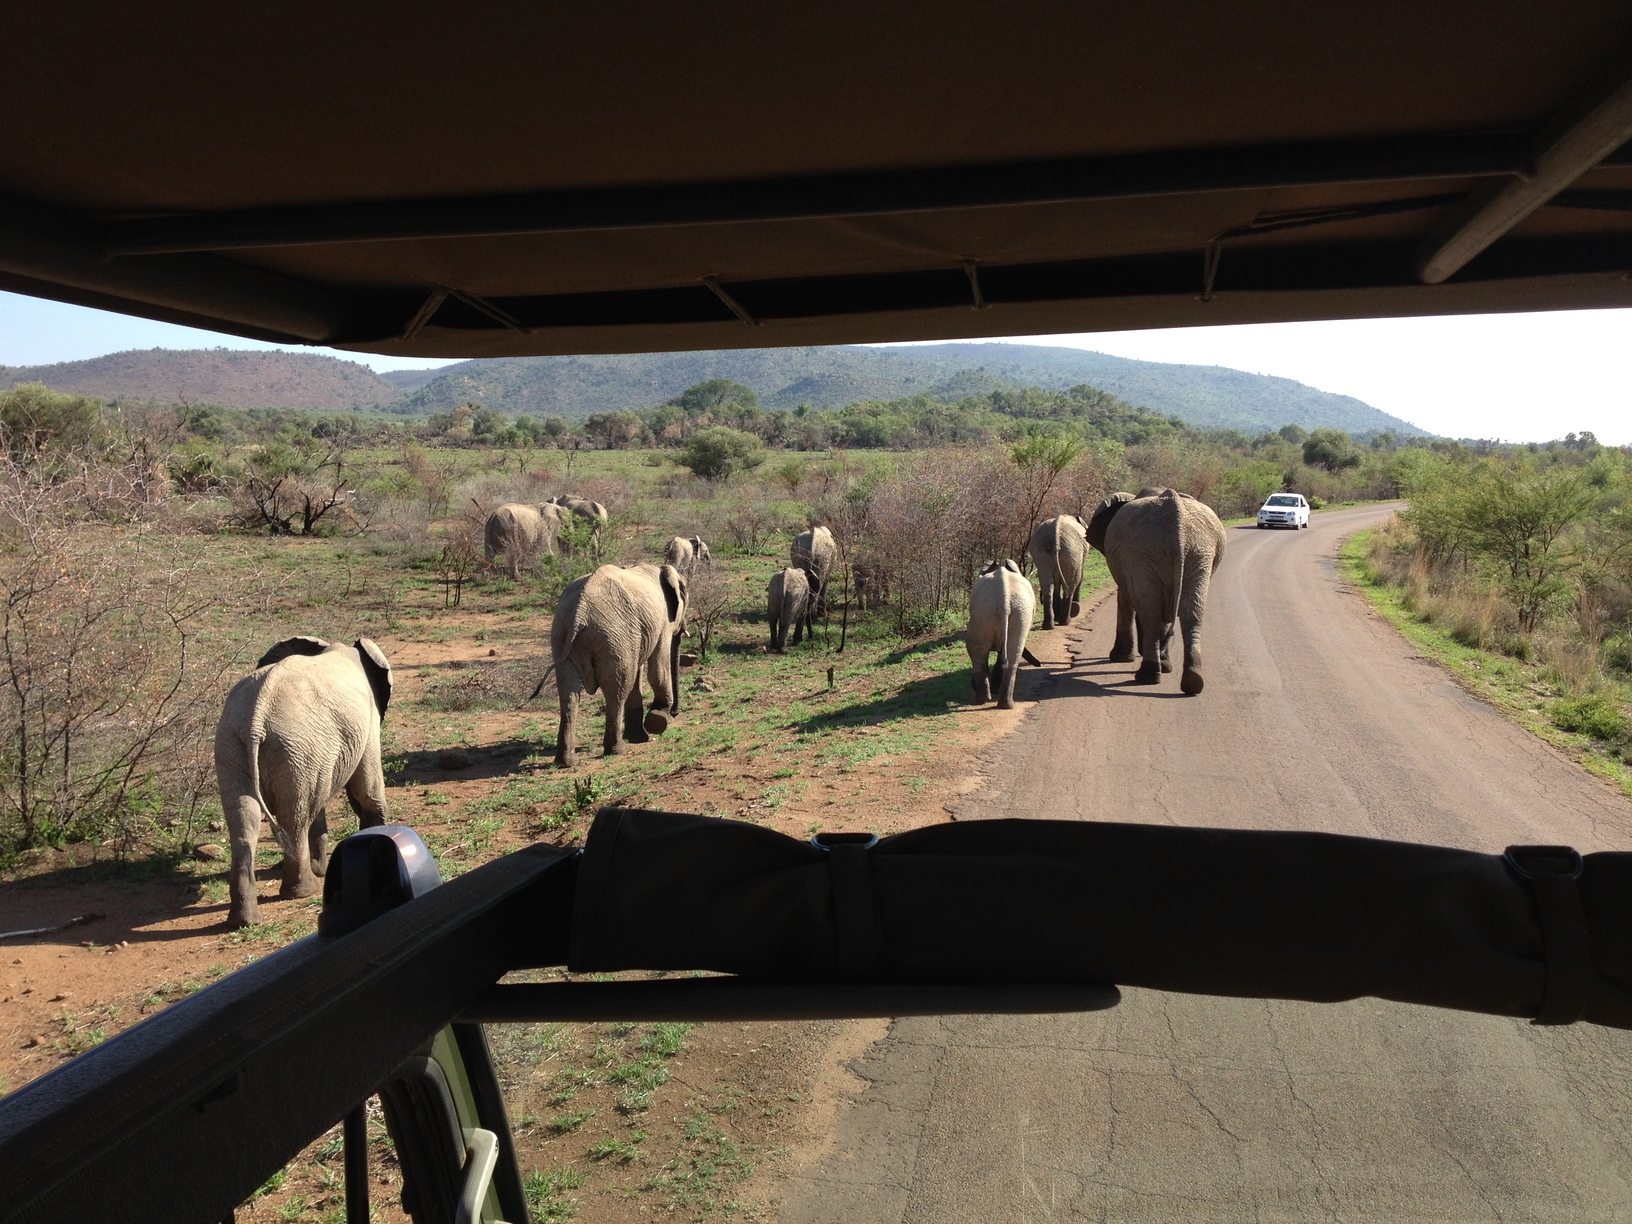 slony na ceste